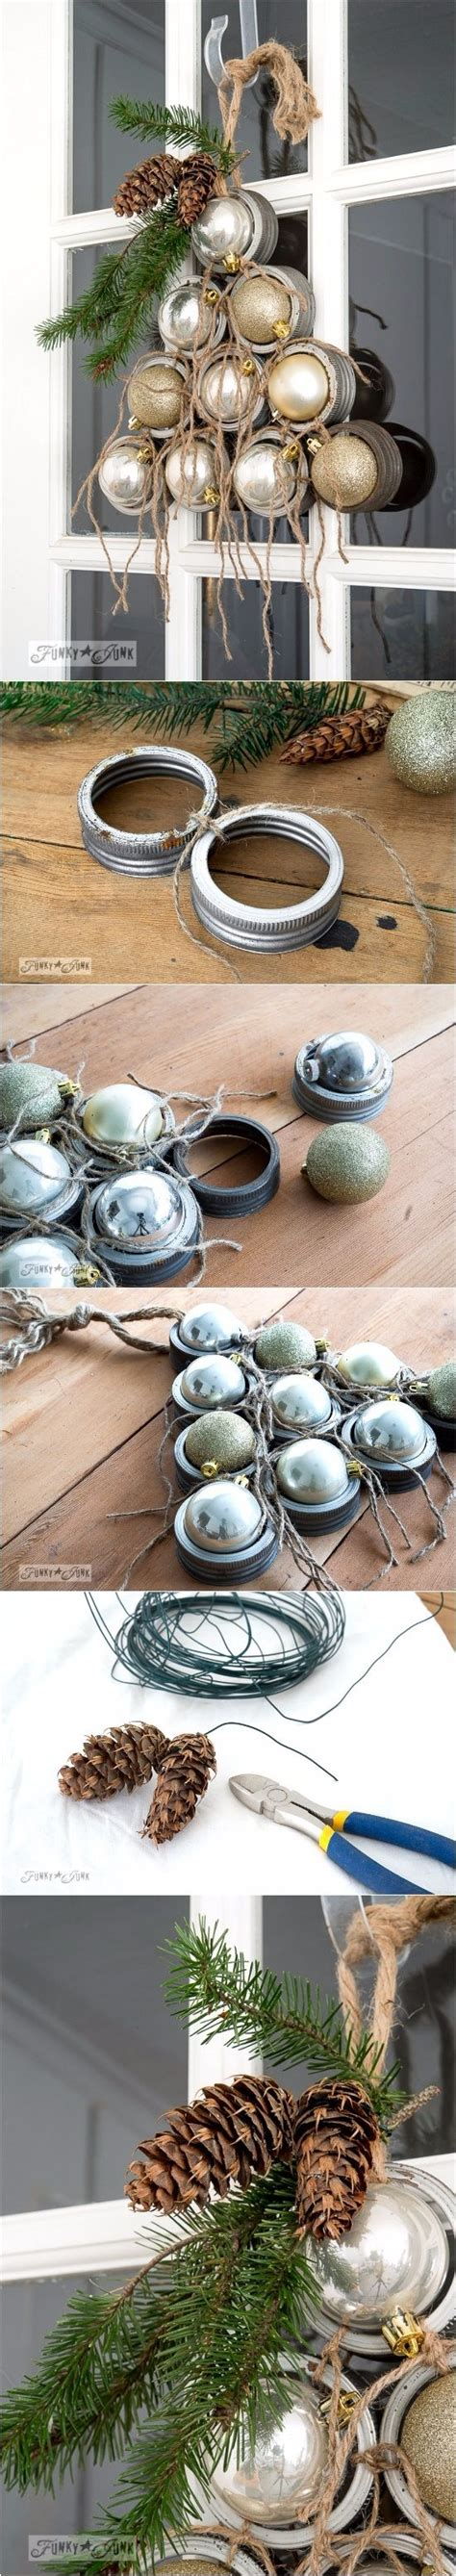 jar lid crafts best 20 mason jar lids ideas on pinterest jar lid crafts mason jar christmas gifts and photo